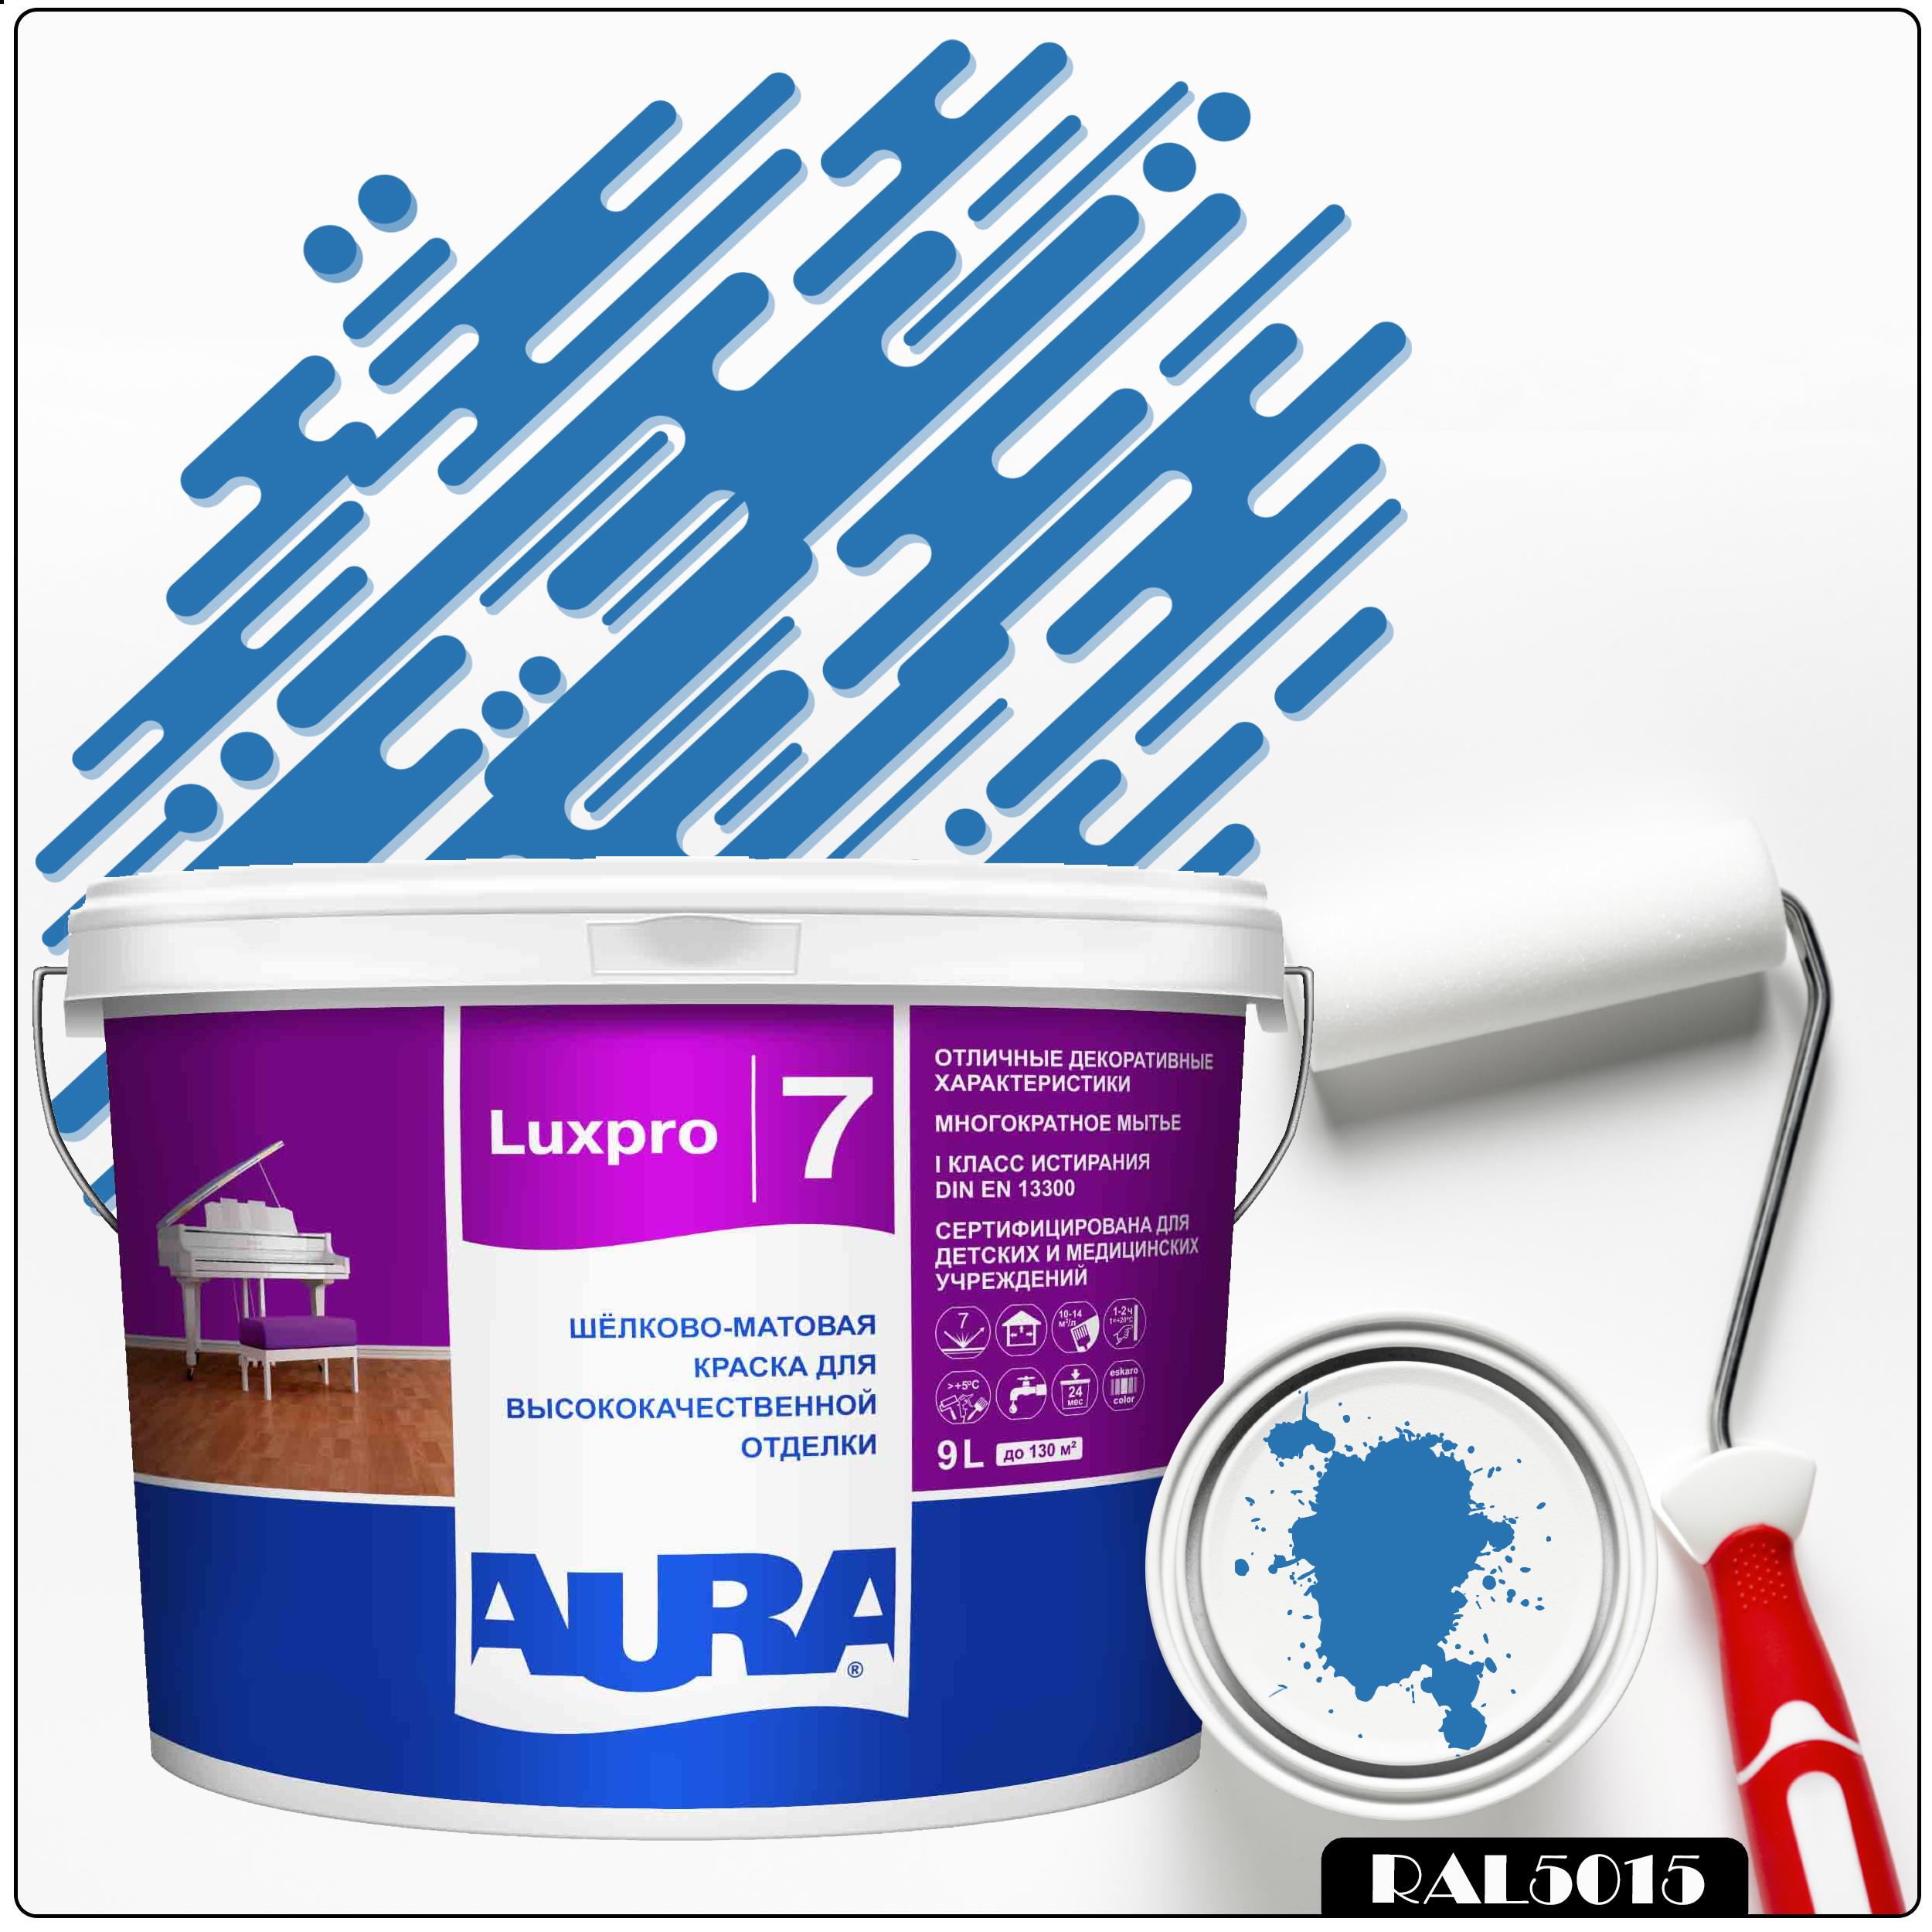 Фото 15 - Краска Aura LuxPRO 7, RAL 5015 Небесно-синий, латексная, шелково-матовая, интерьерная, 9л, Аура.